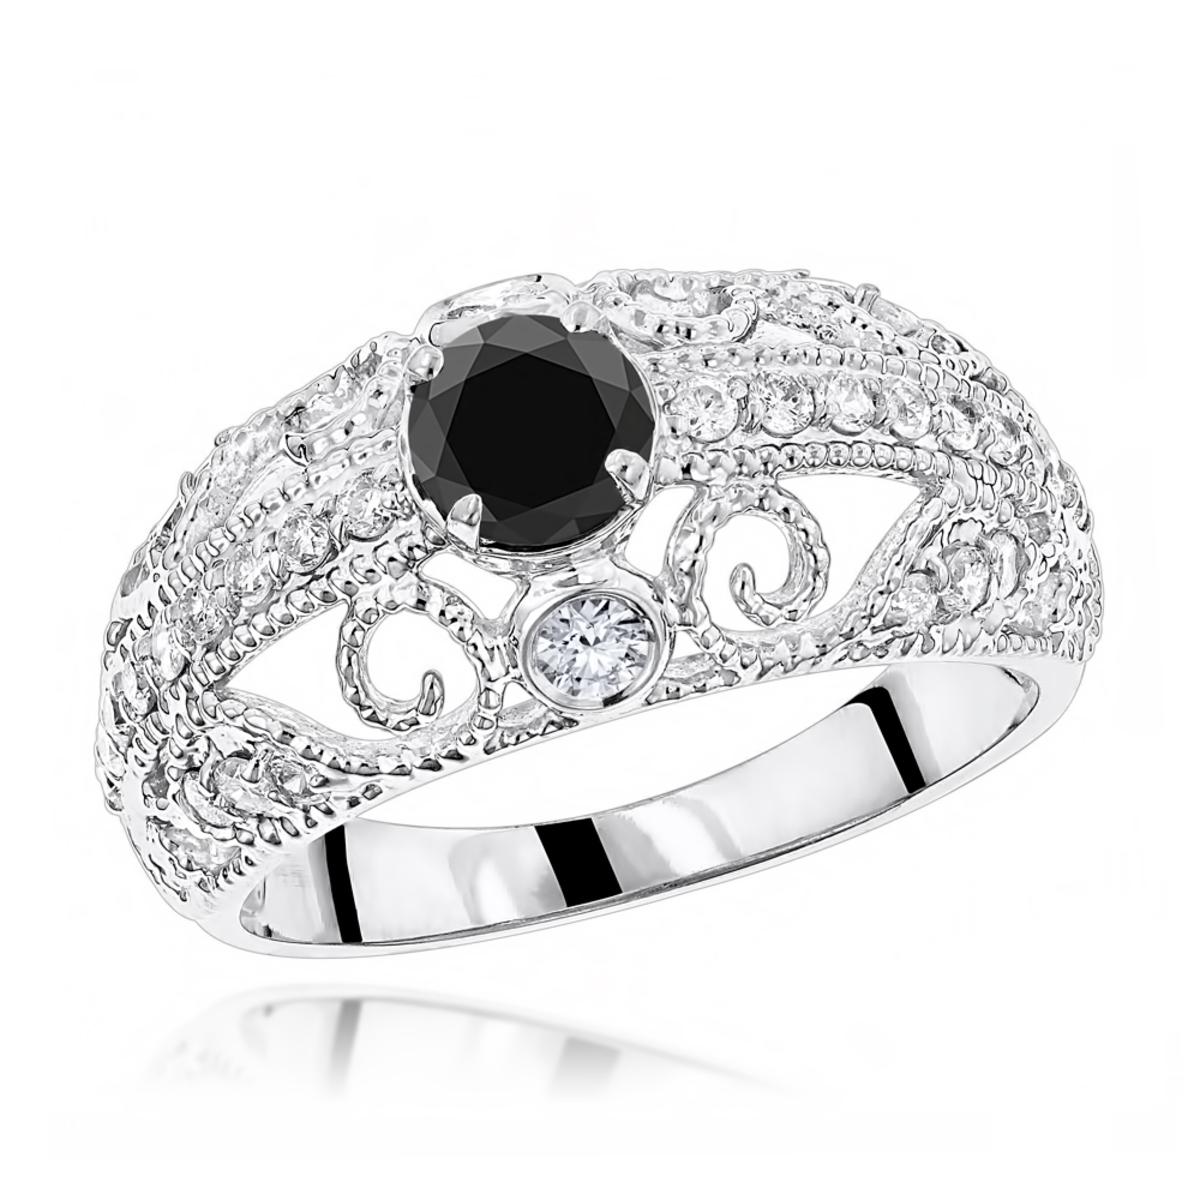 Antique White Black Diamond Engagement Ring with Filigree 1.2ct 14K Gold